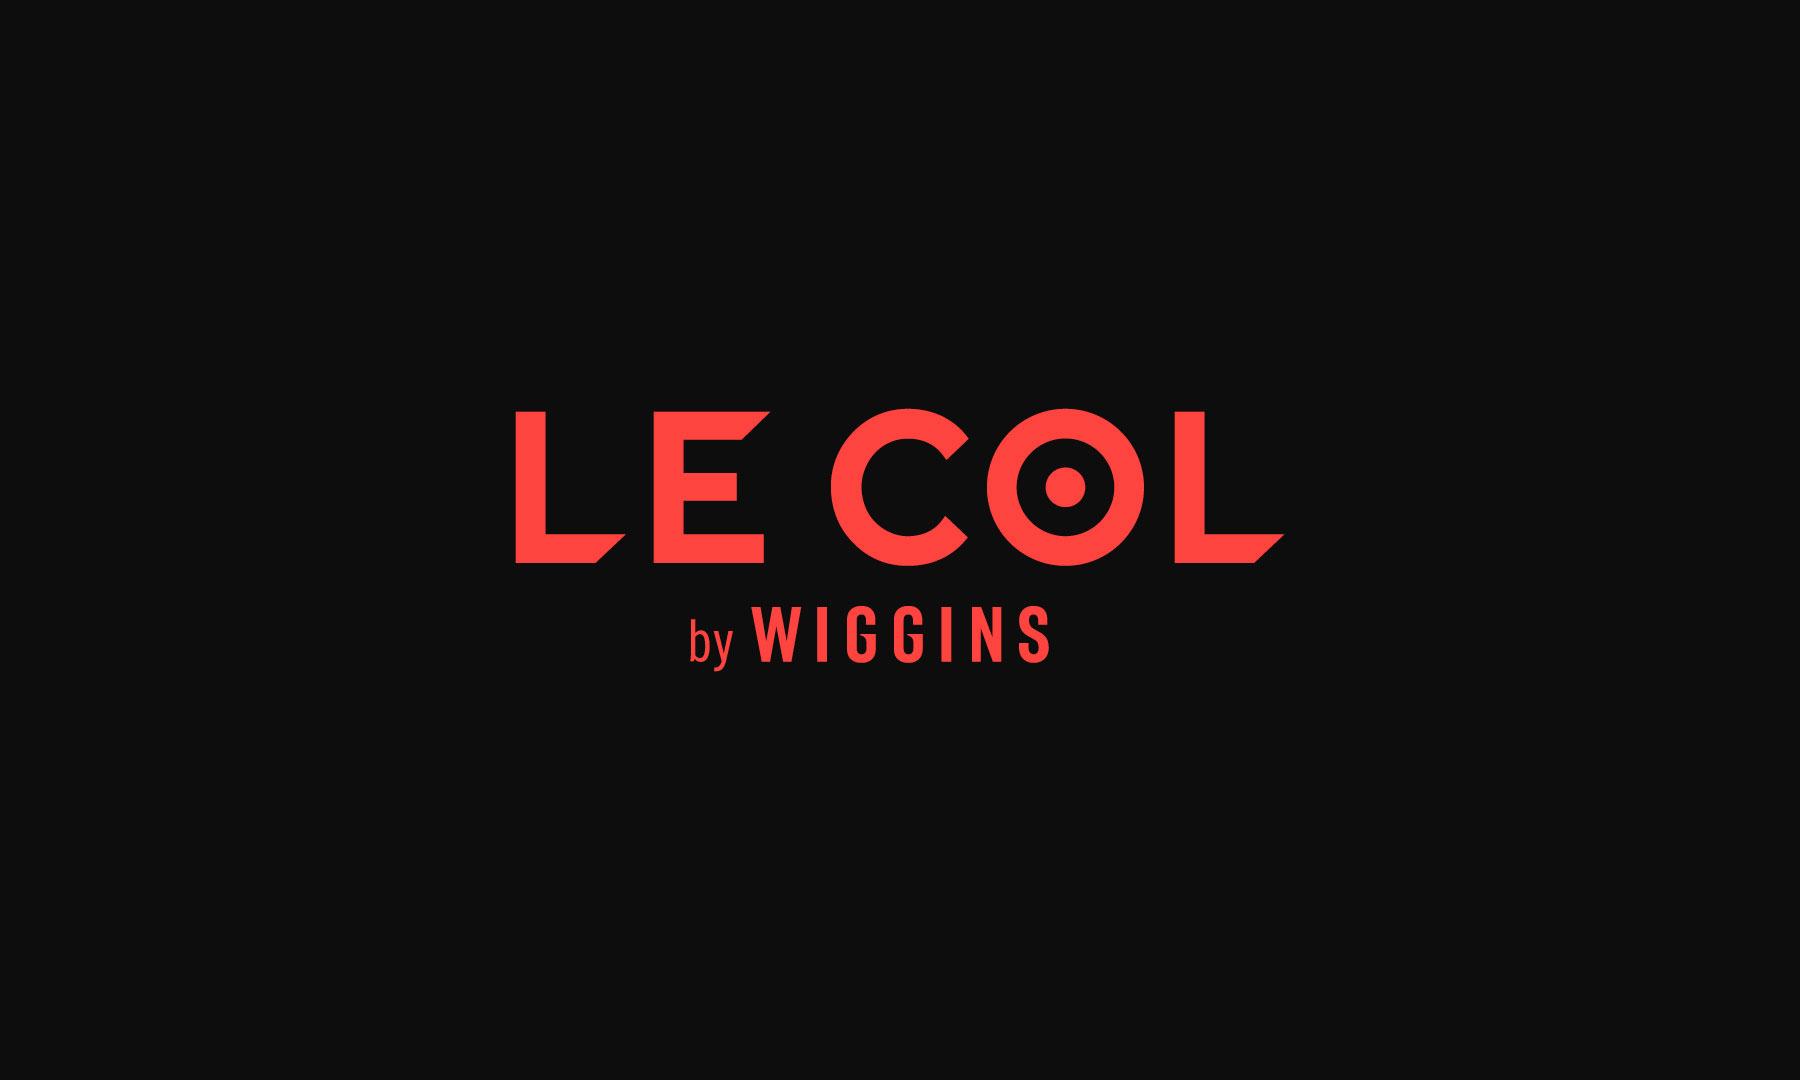 wiggins_x_LeCol